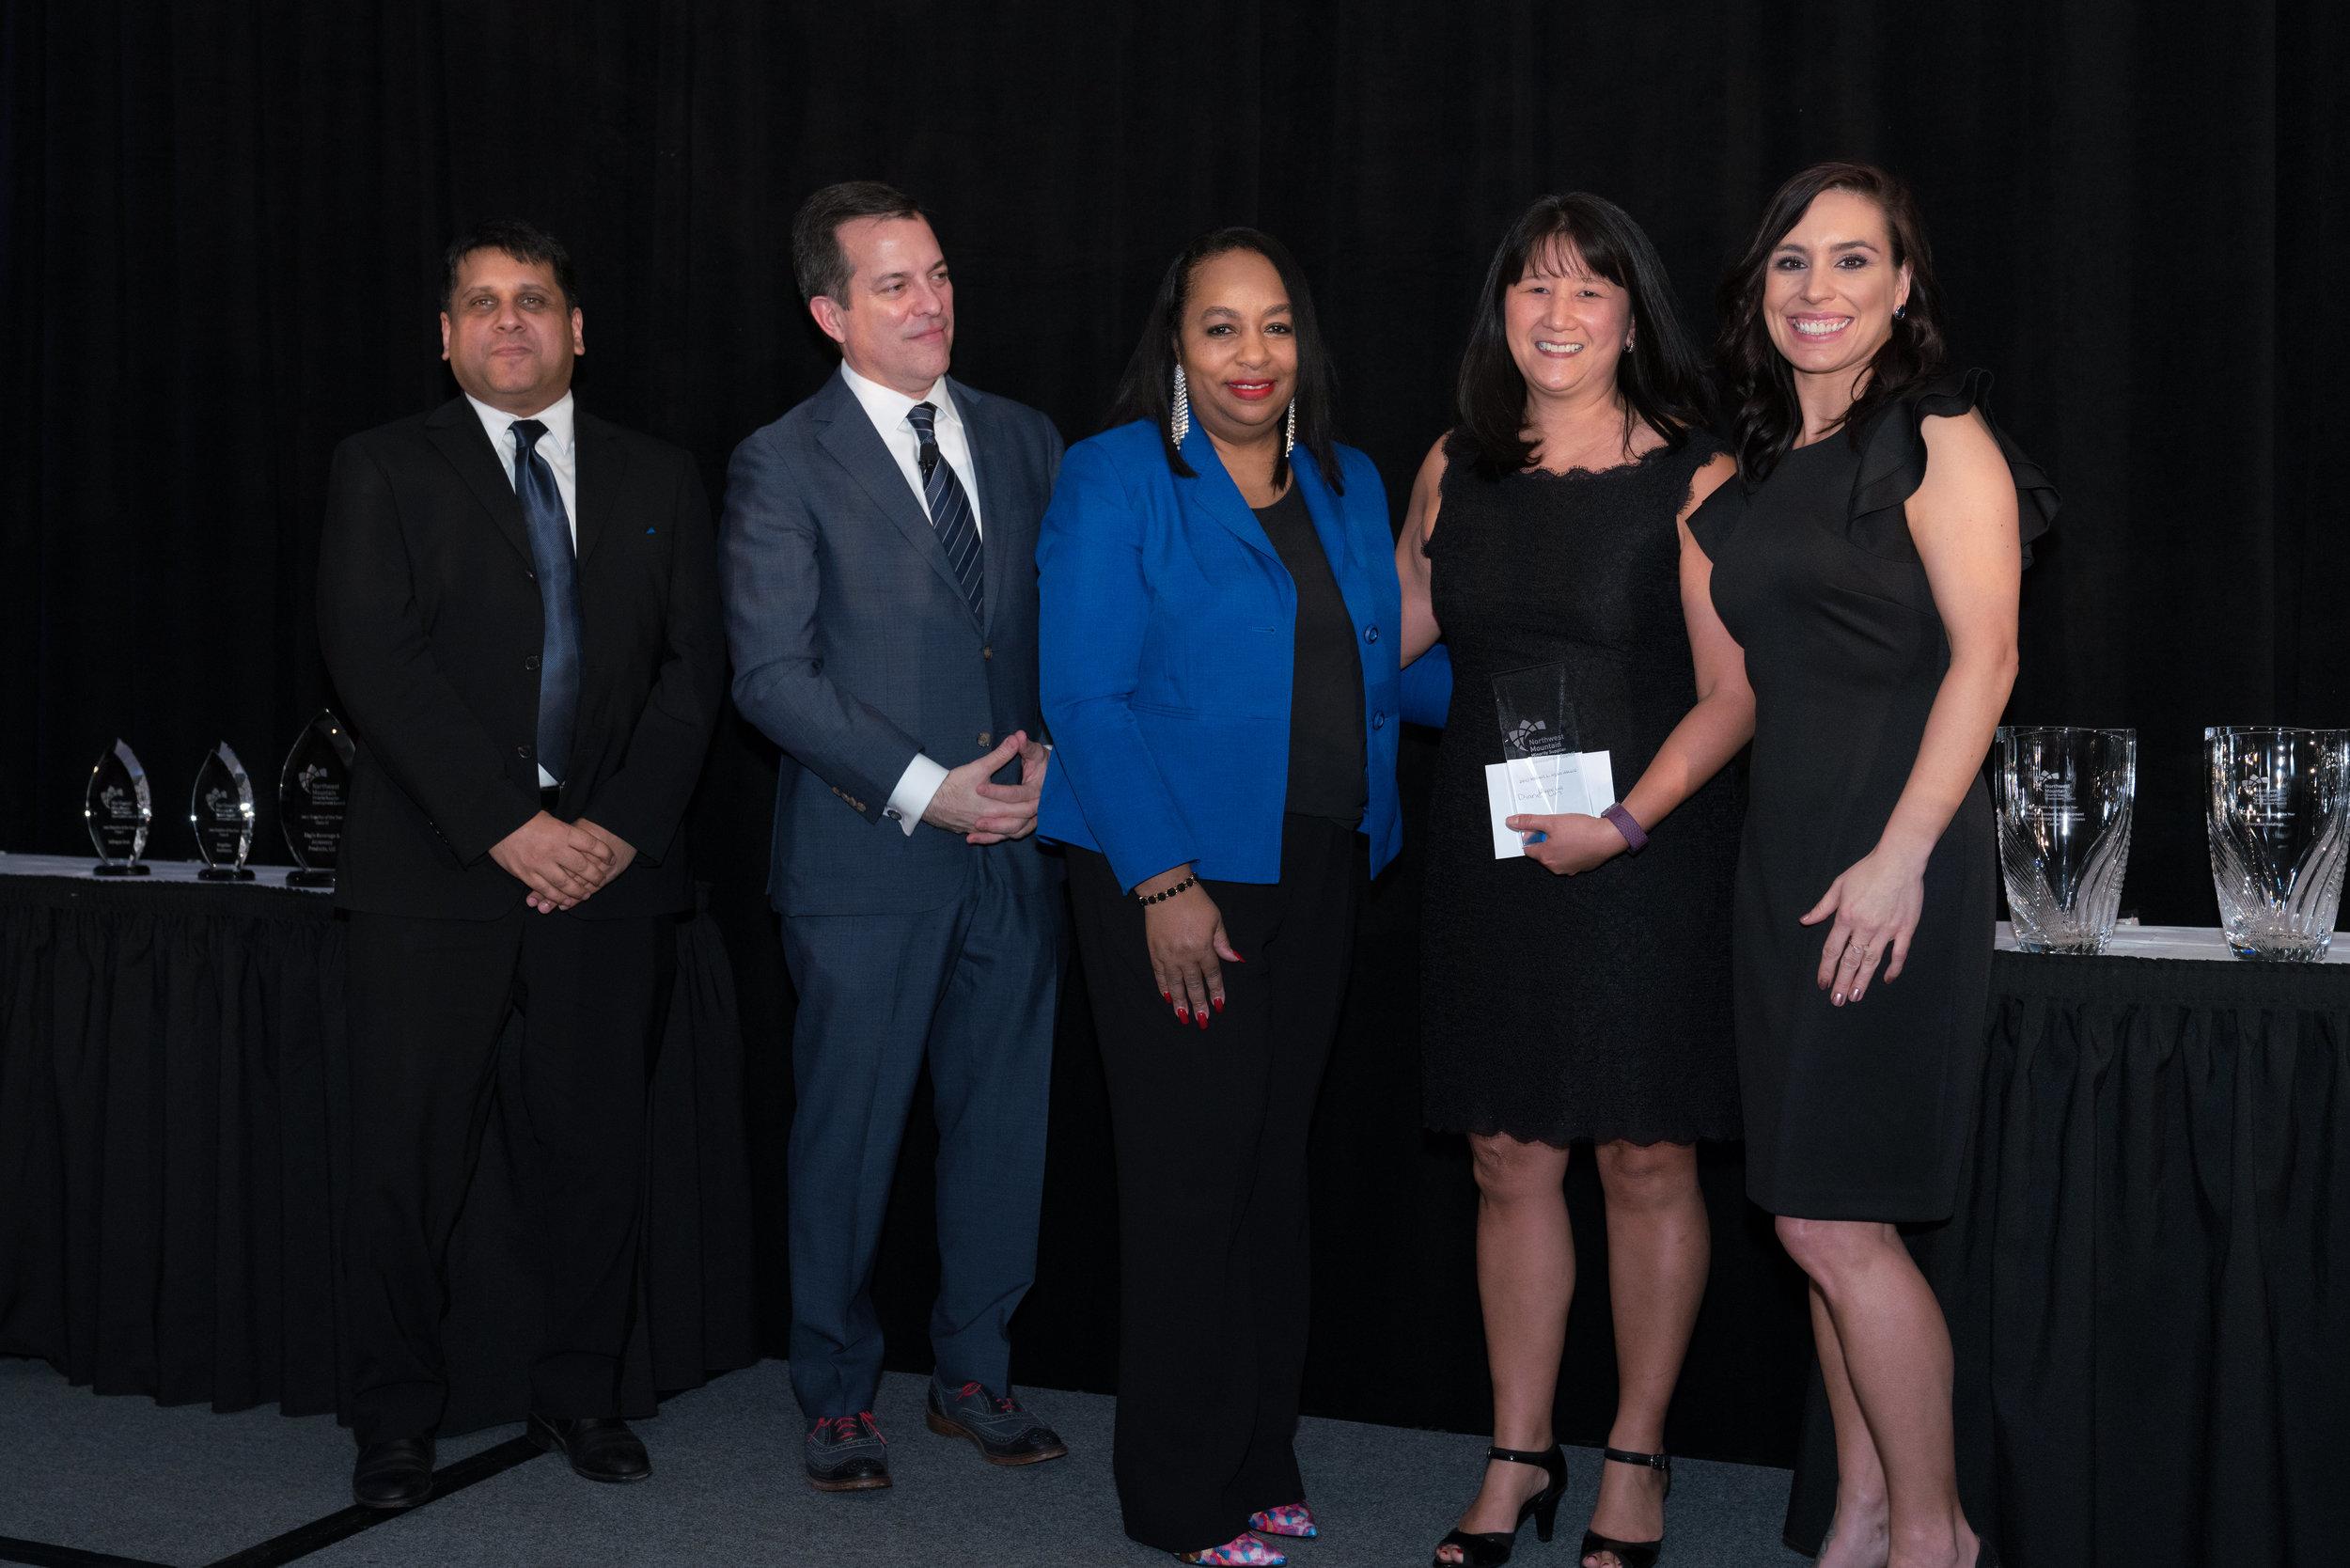 Diane Lin - 2017 Robert L. Ryan Award